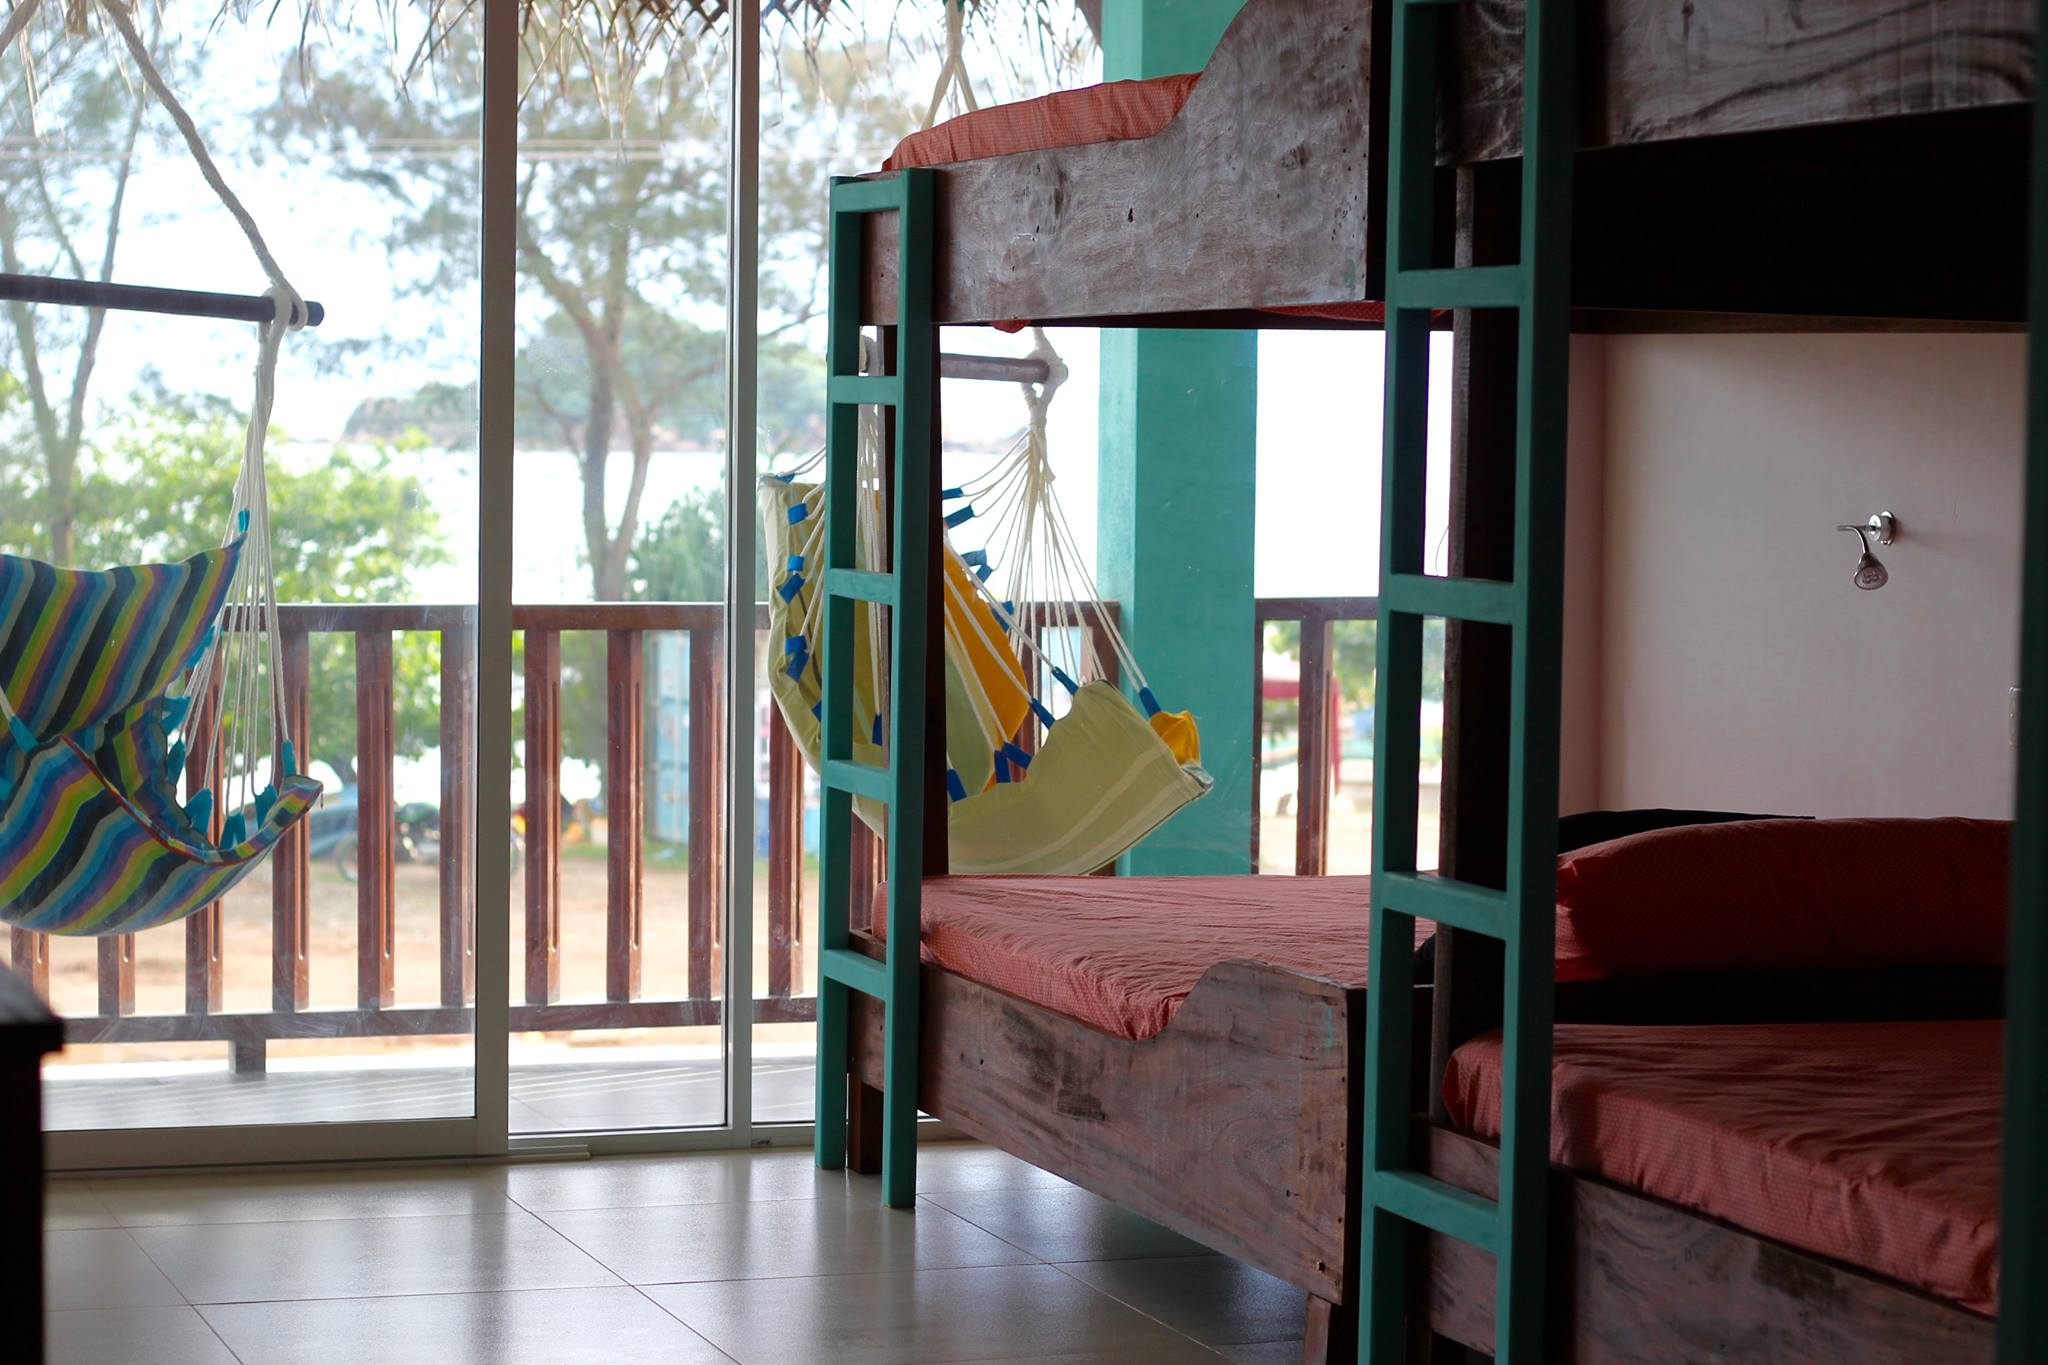 Hangtime - Accommodation - Dorm Room